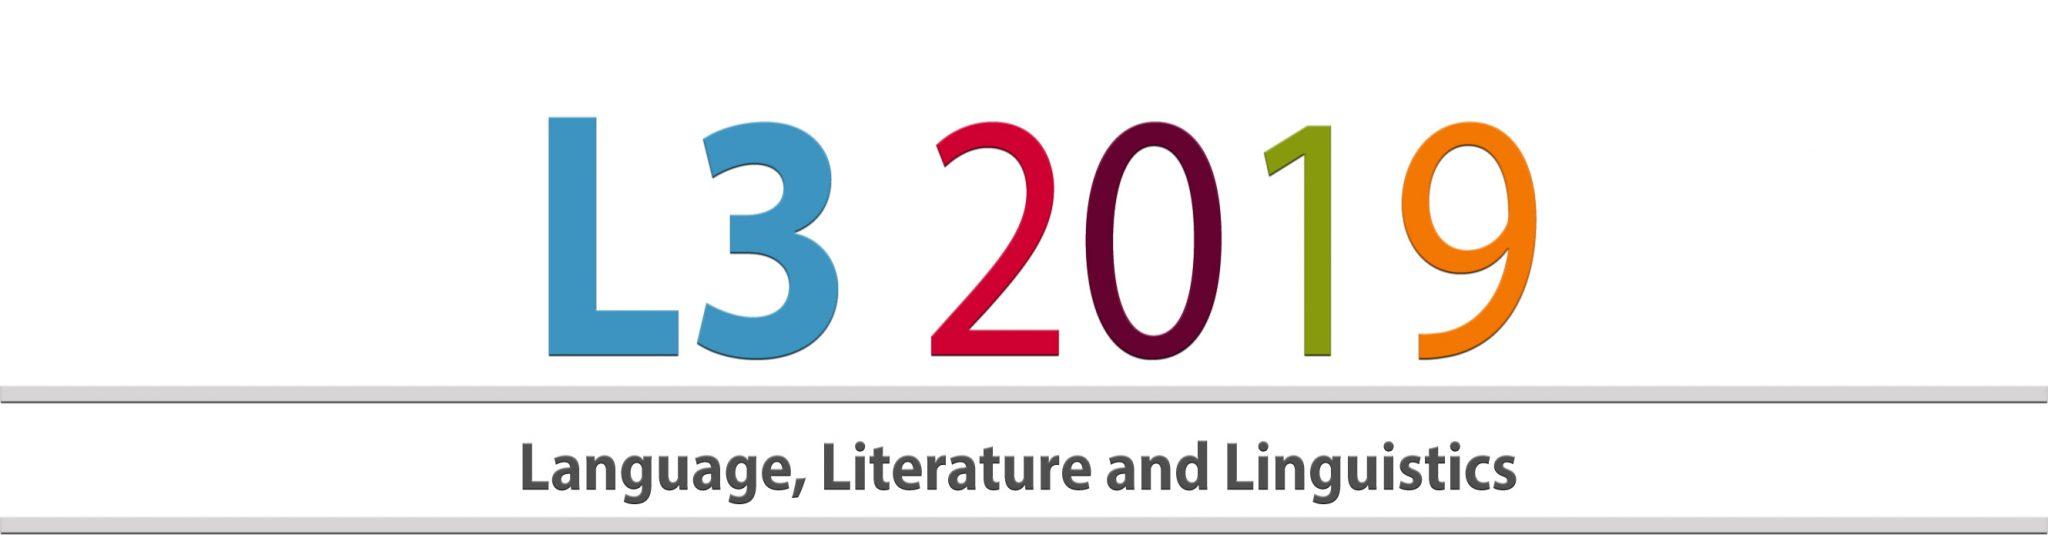 Conference on Language, Literature & Linguistics – L3 2019